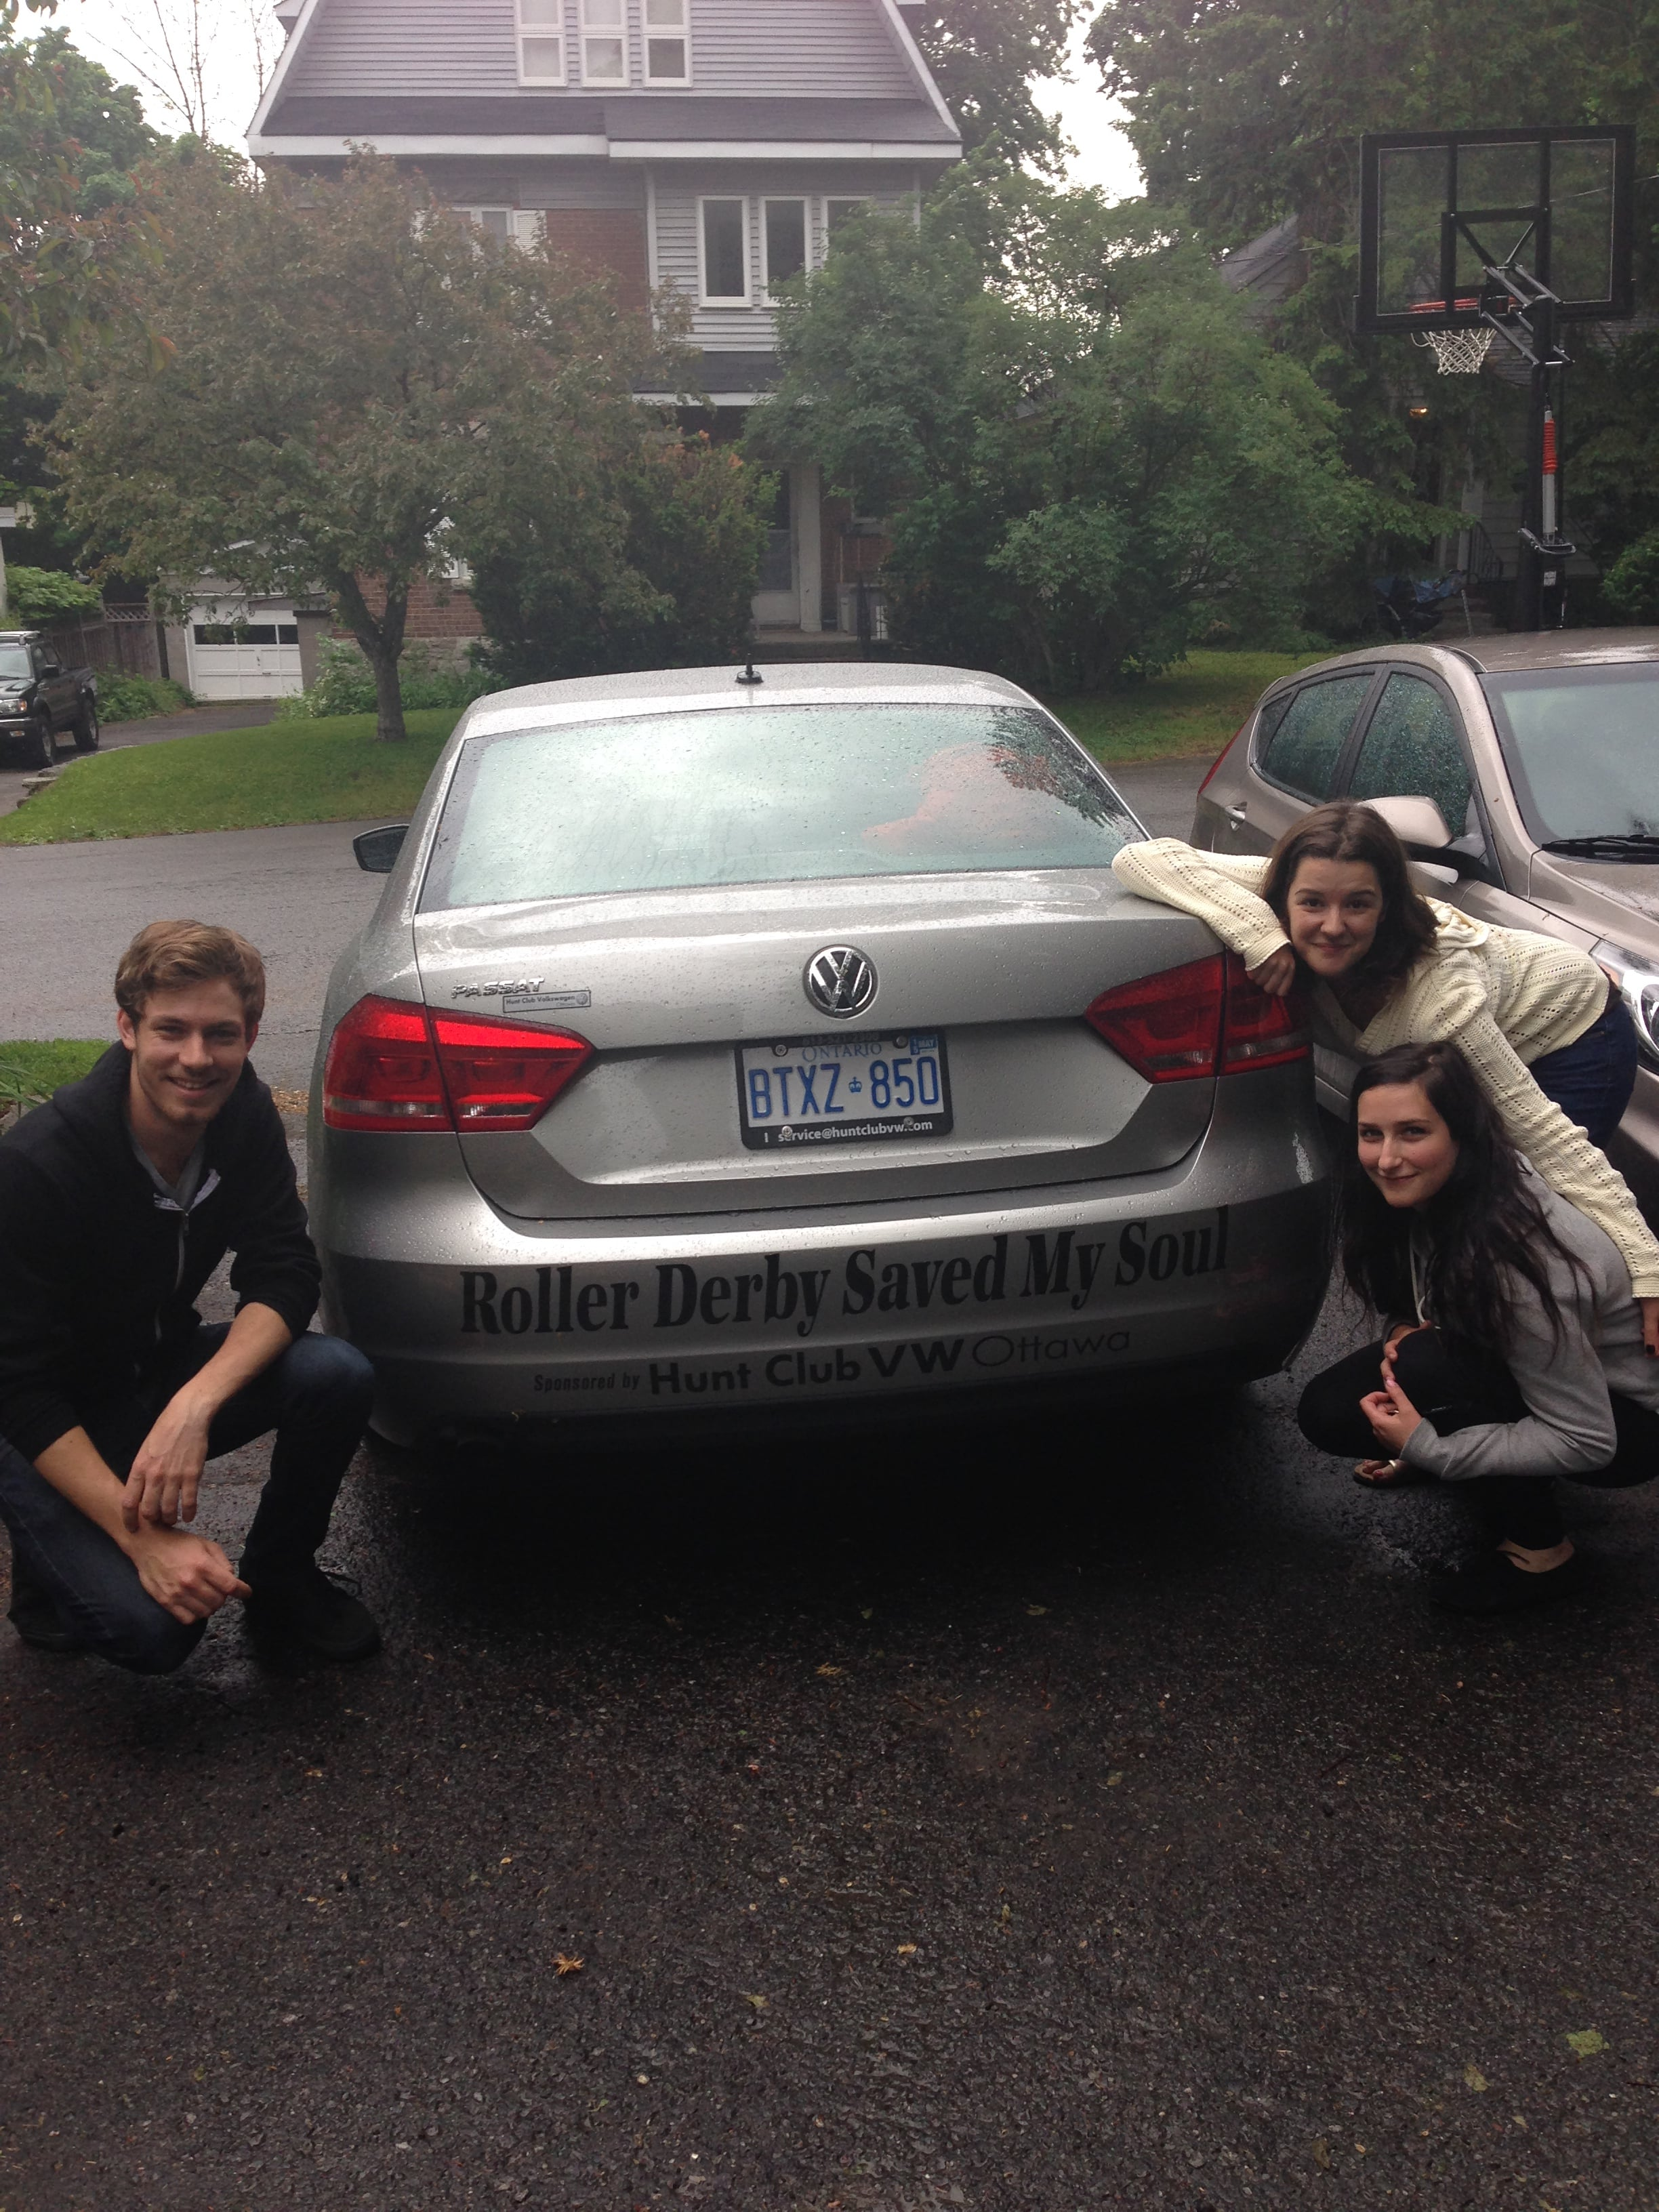 Thank you, Hunt Club Volkswagen in Ottawa!